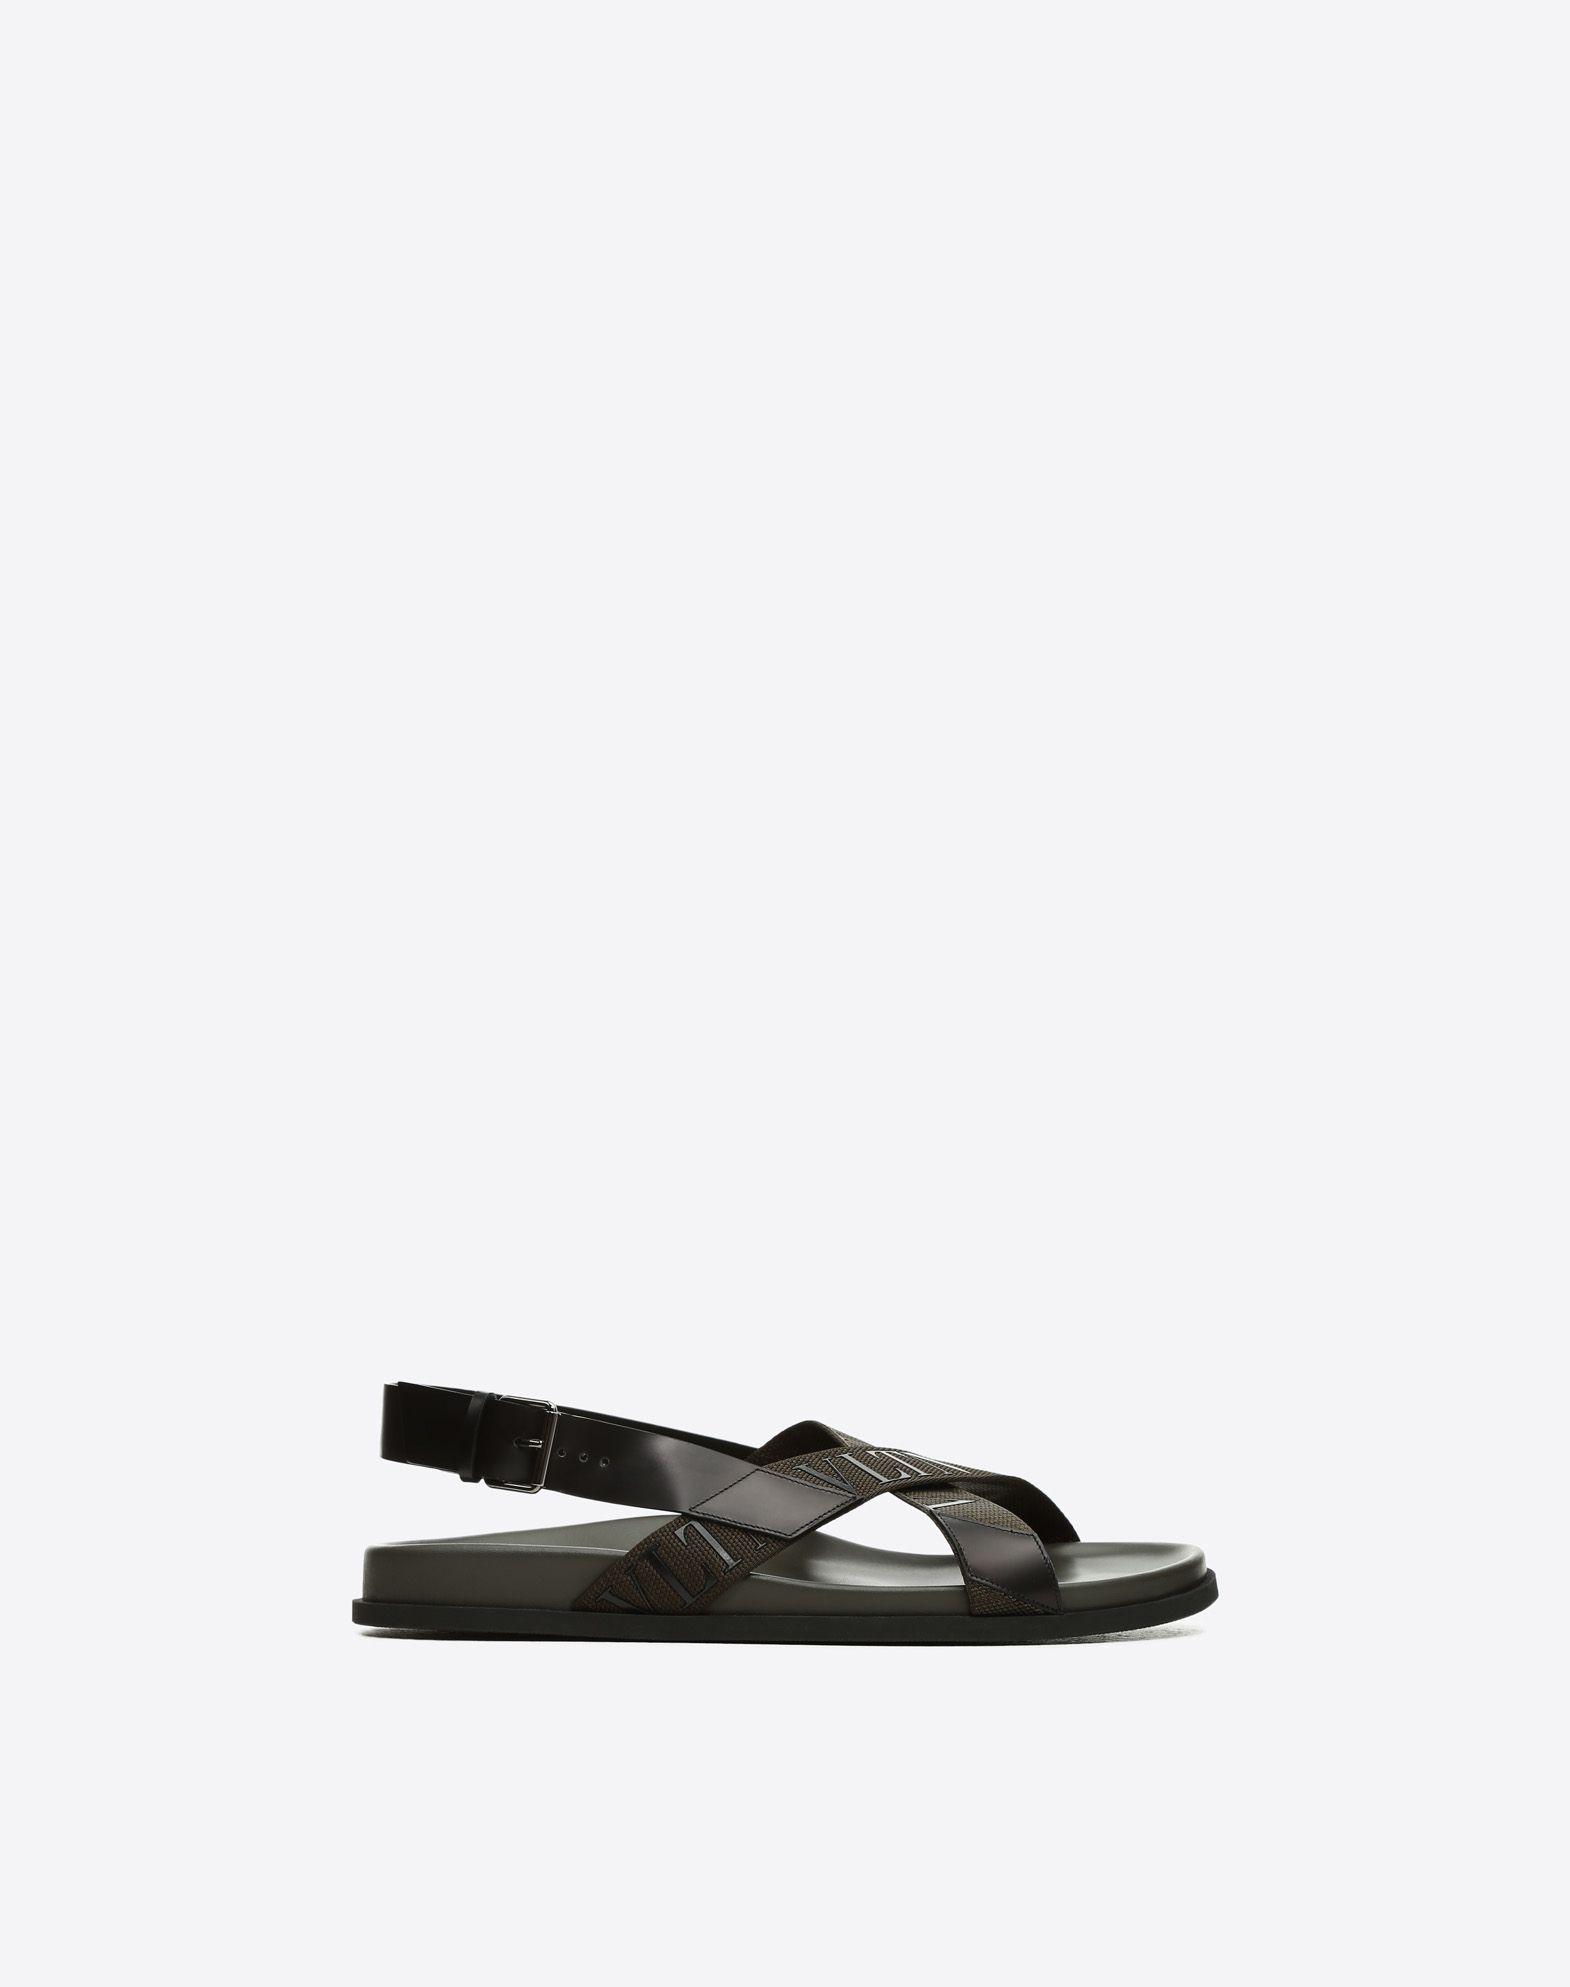 VALENTINO GARAVANI UOMO Low VLTN sandal  FLAT SANDALS U f